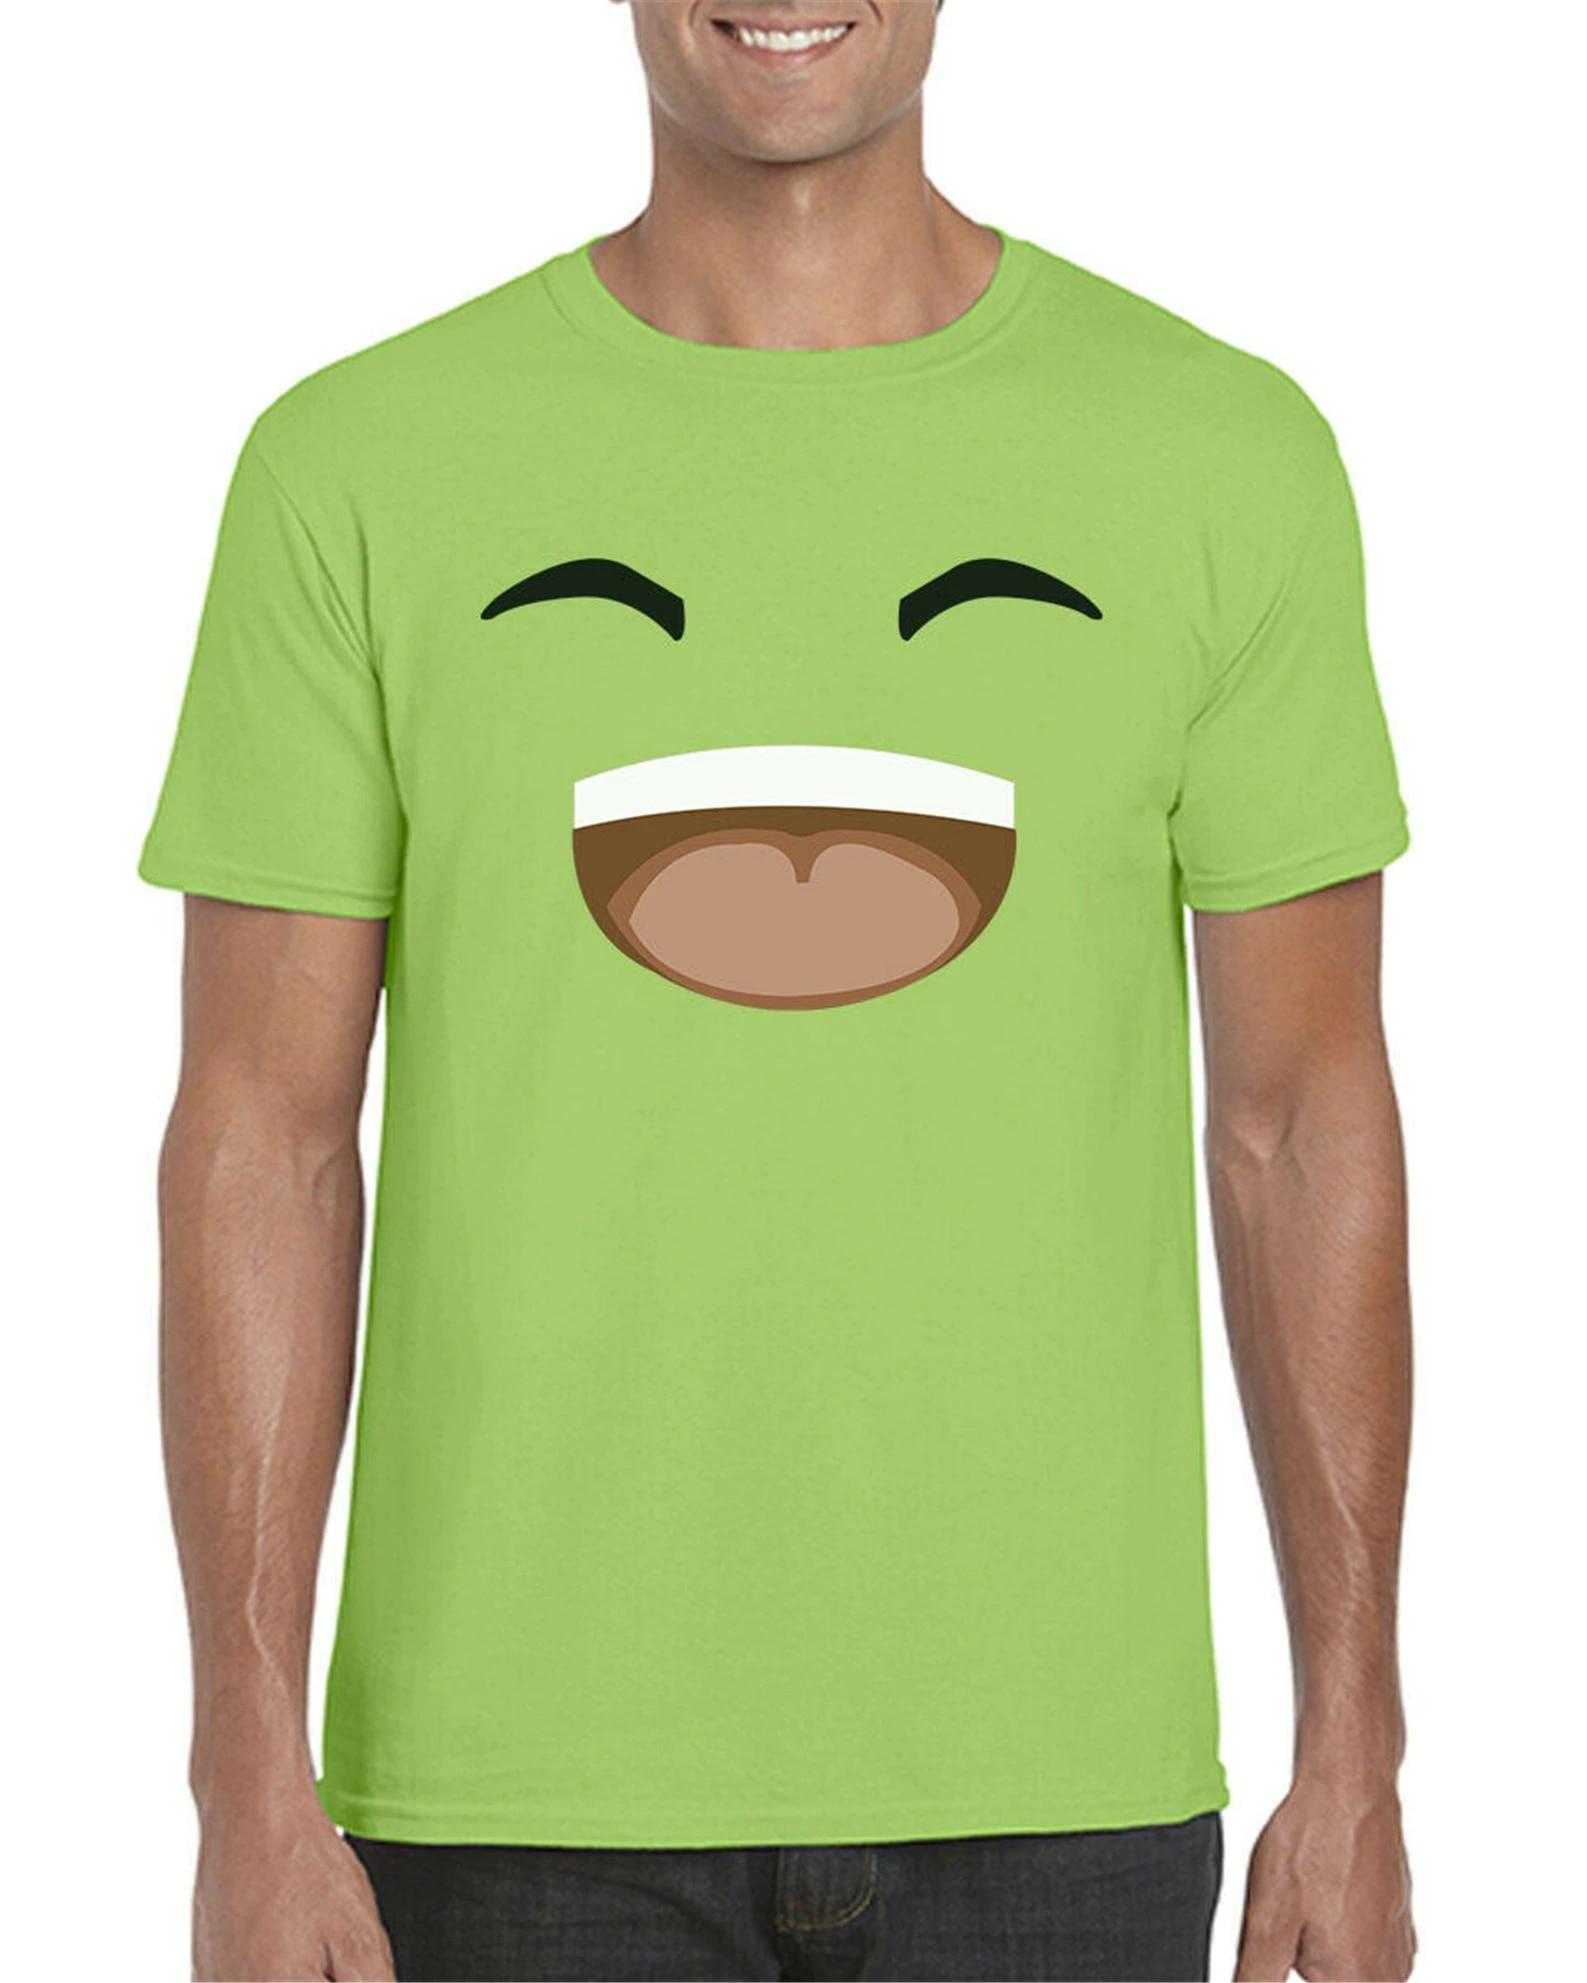 Smile Jelly Merch Youtuber Kids T-Shirt Gamer Tee Top Boy Girl Hoody YS-YXL Size